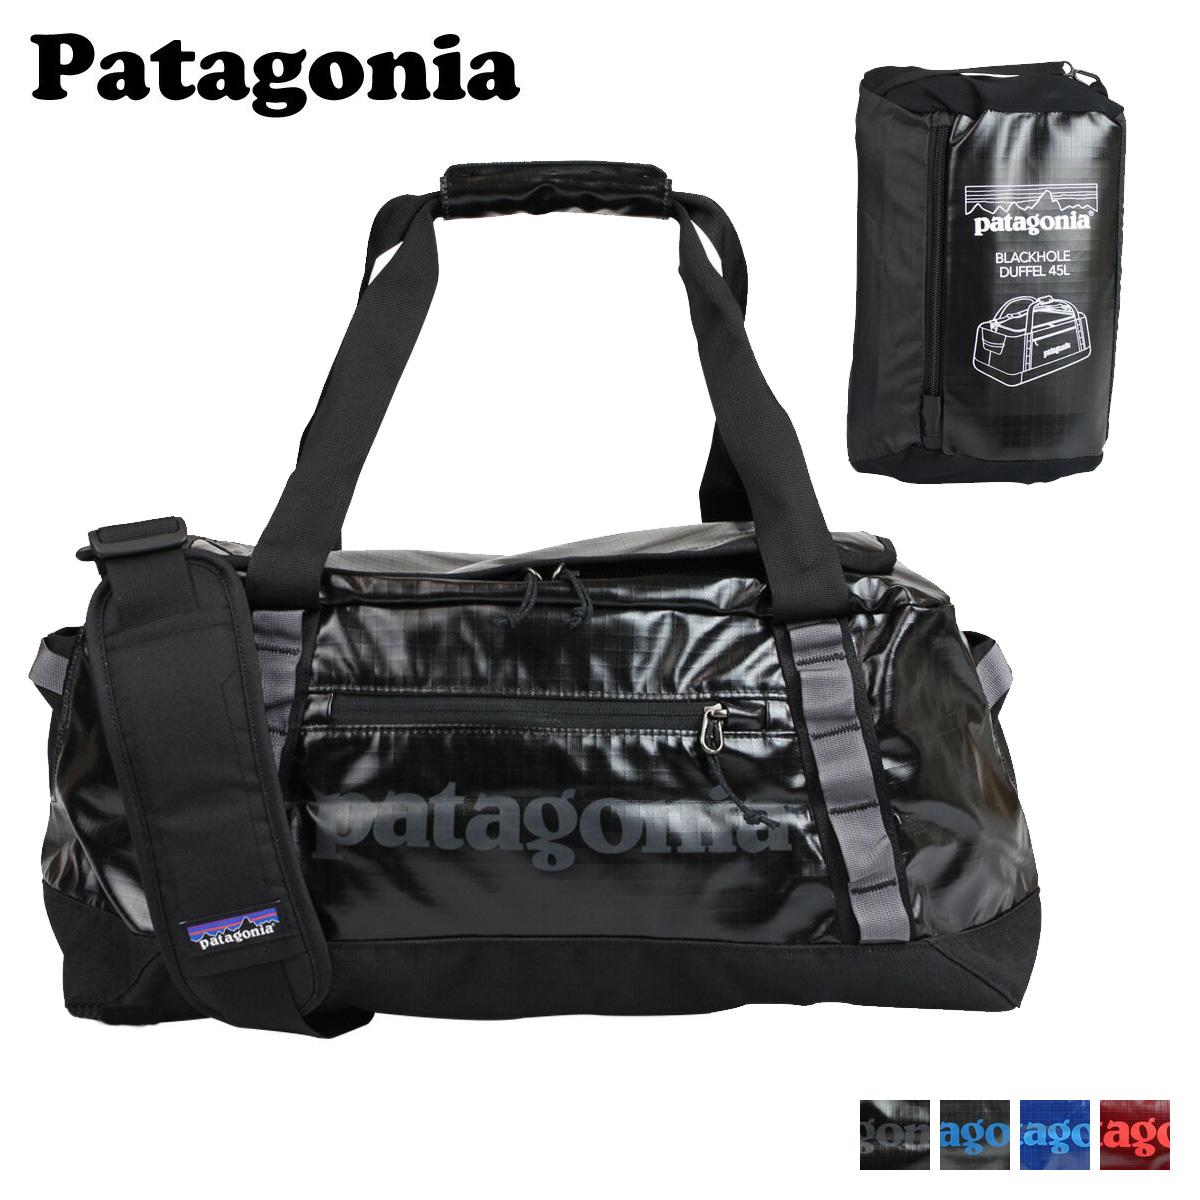 patagonia パタゴニア バッグ ダッフルバッグ ボストンバッグ BLACK HOLE DUFFEL 45L メンズ レディース 49336 [10/19 追加入荷]